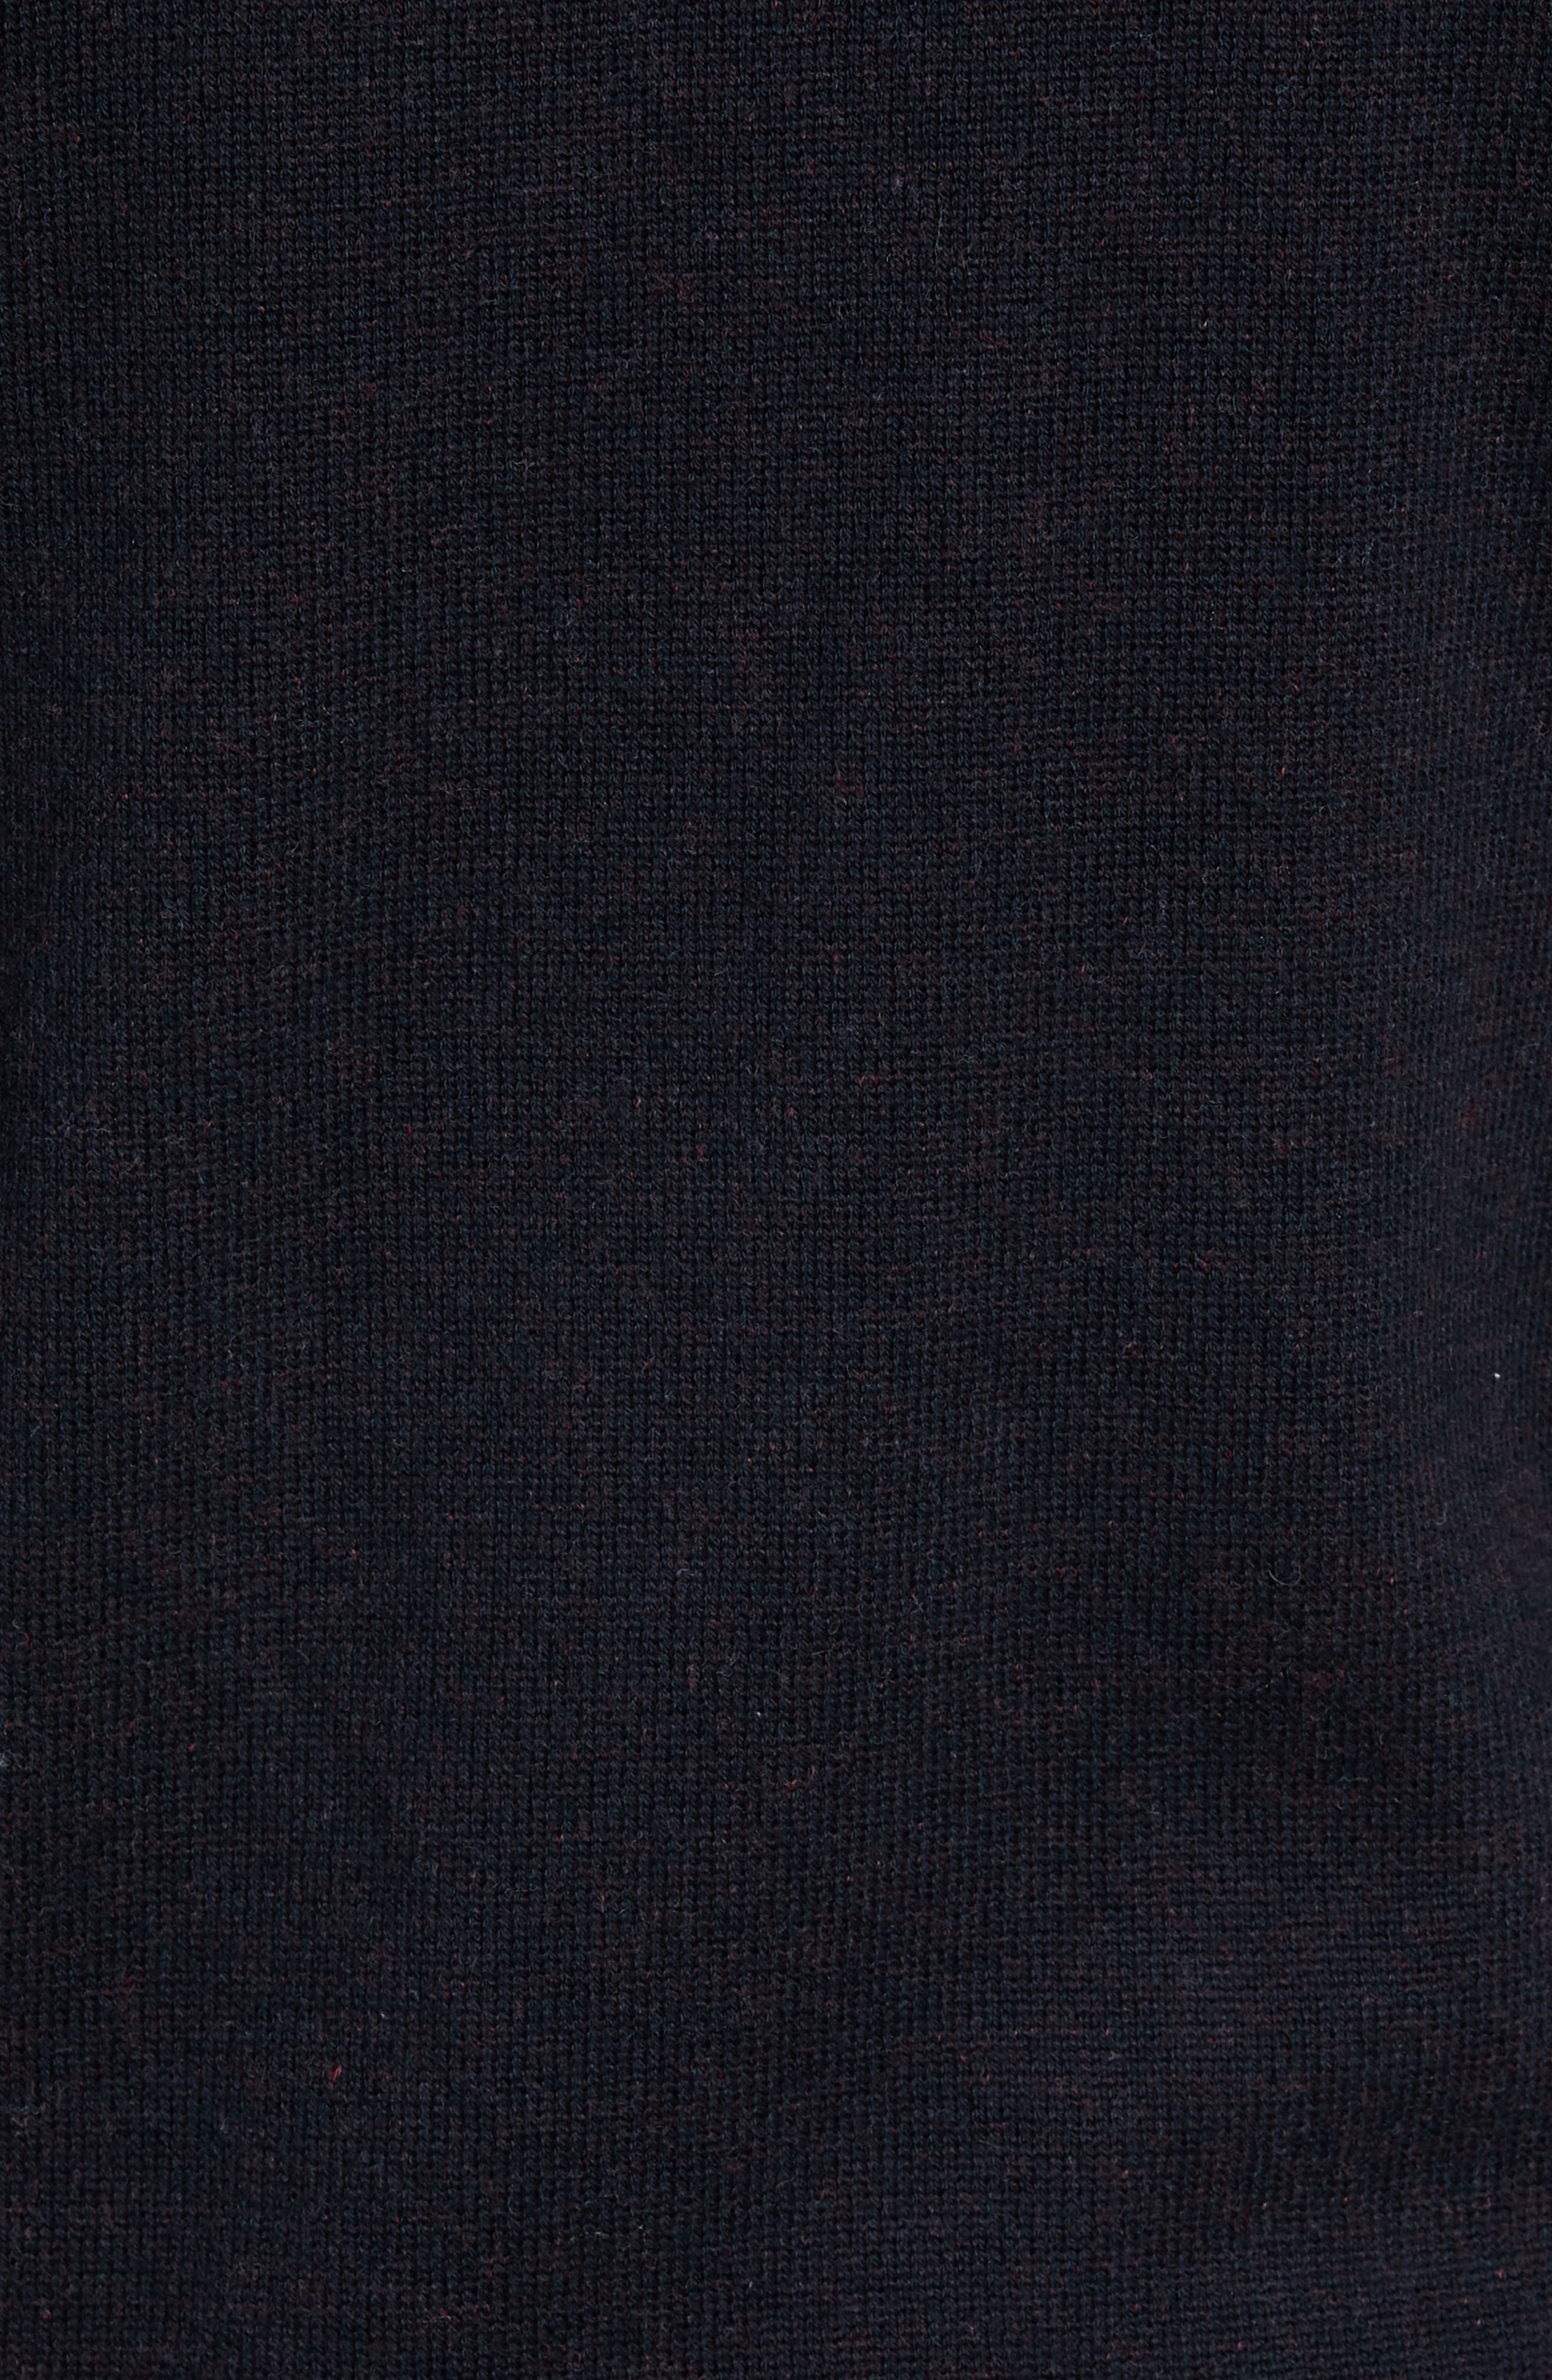 Regular Fit Cotton & Cashmere Hoodie,                             Alternate thumbnail 5, color,                             001